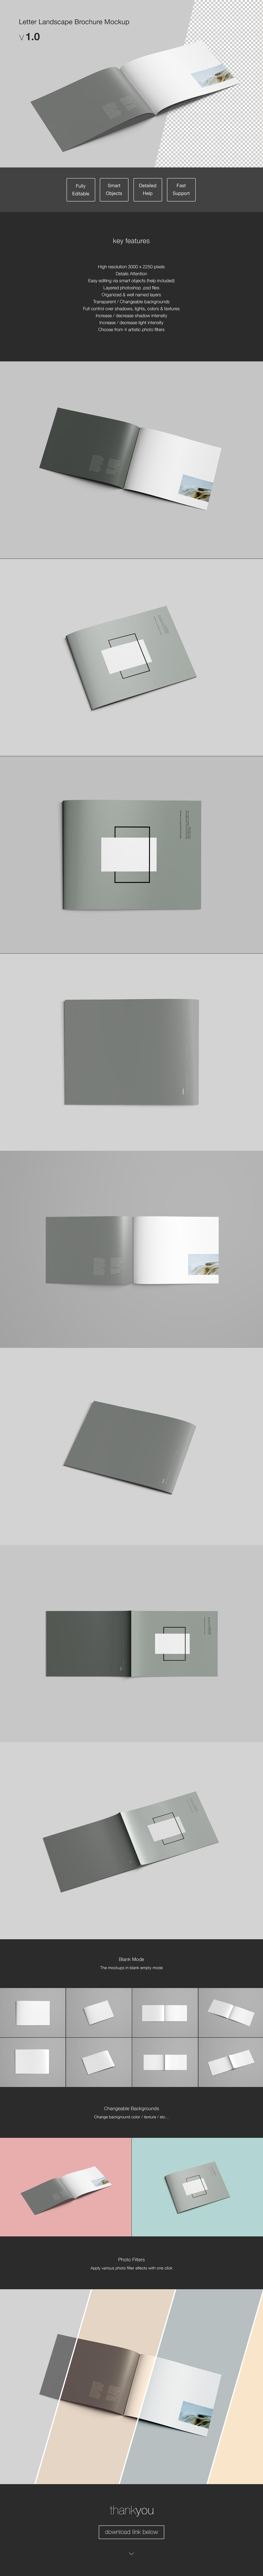 D Photorealistic Letter Horizontal  Landscape Brochure Mockup